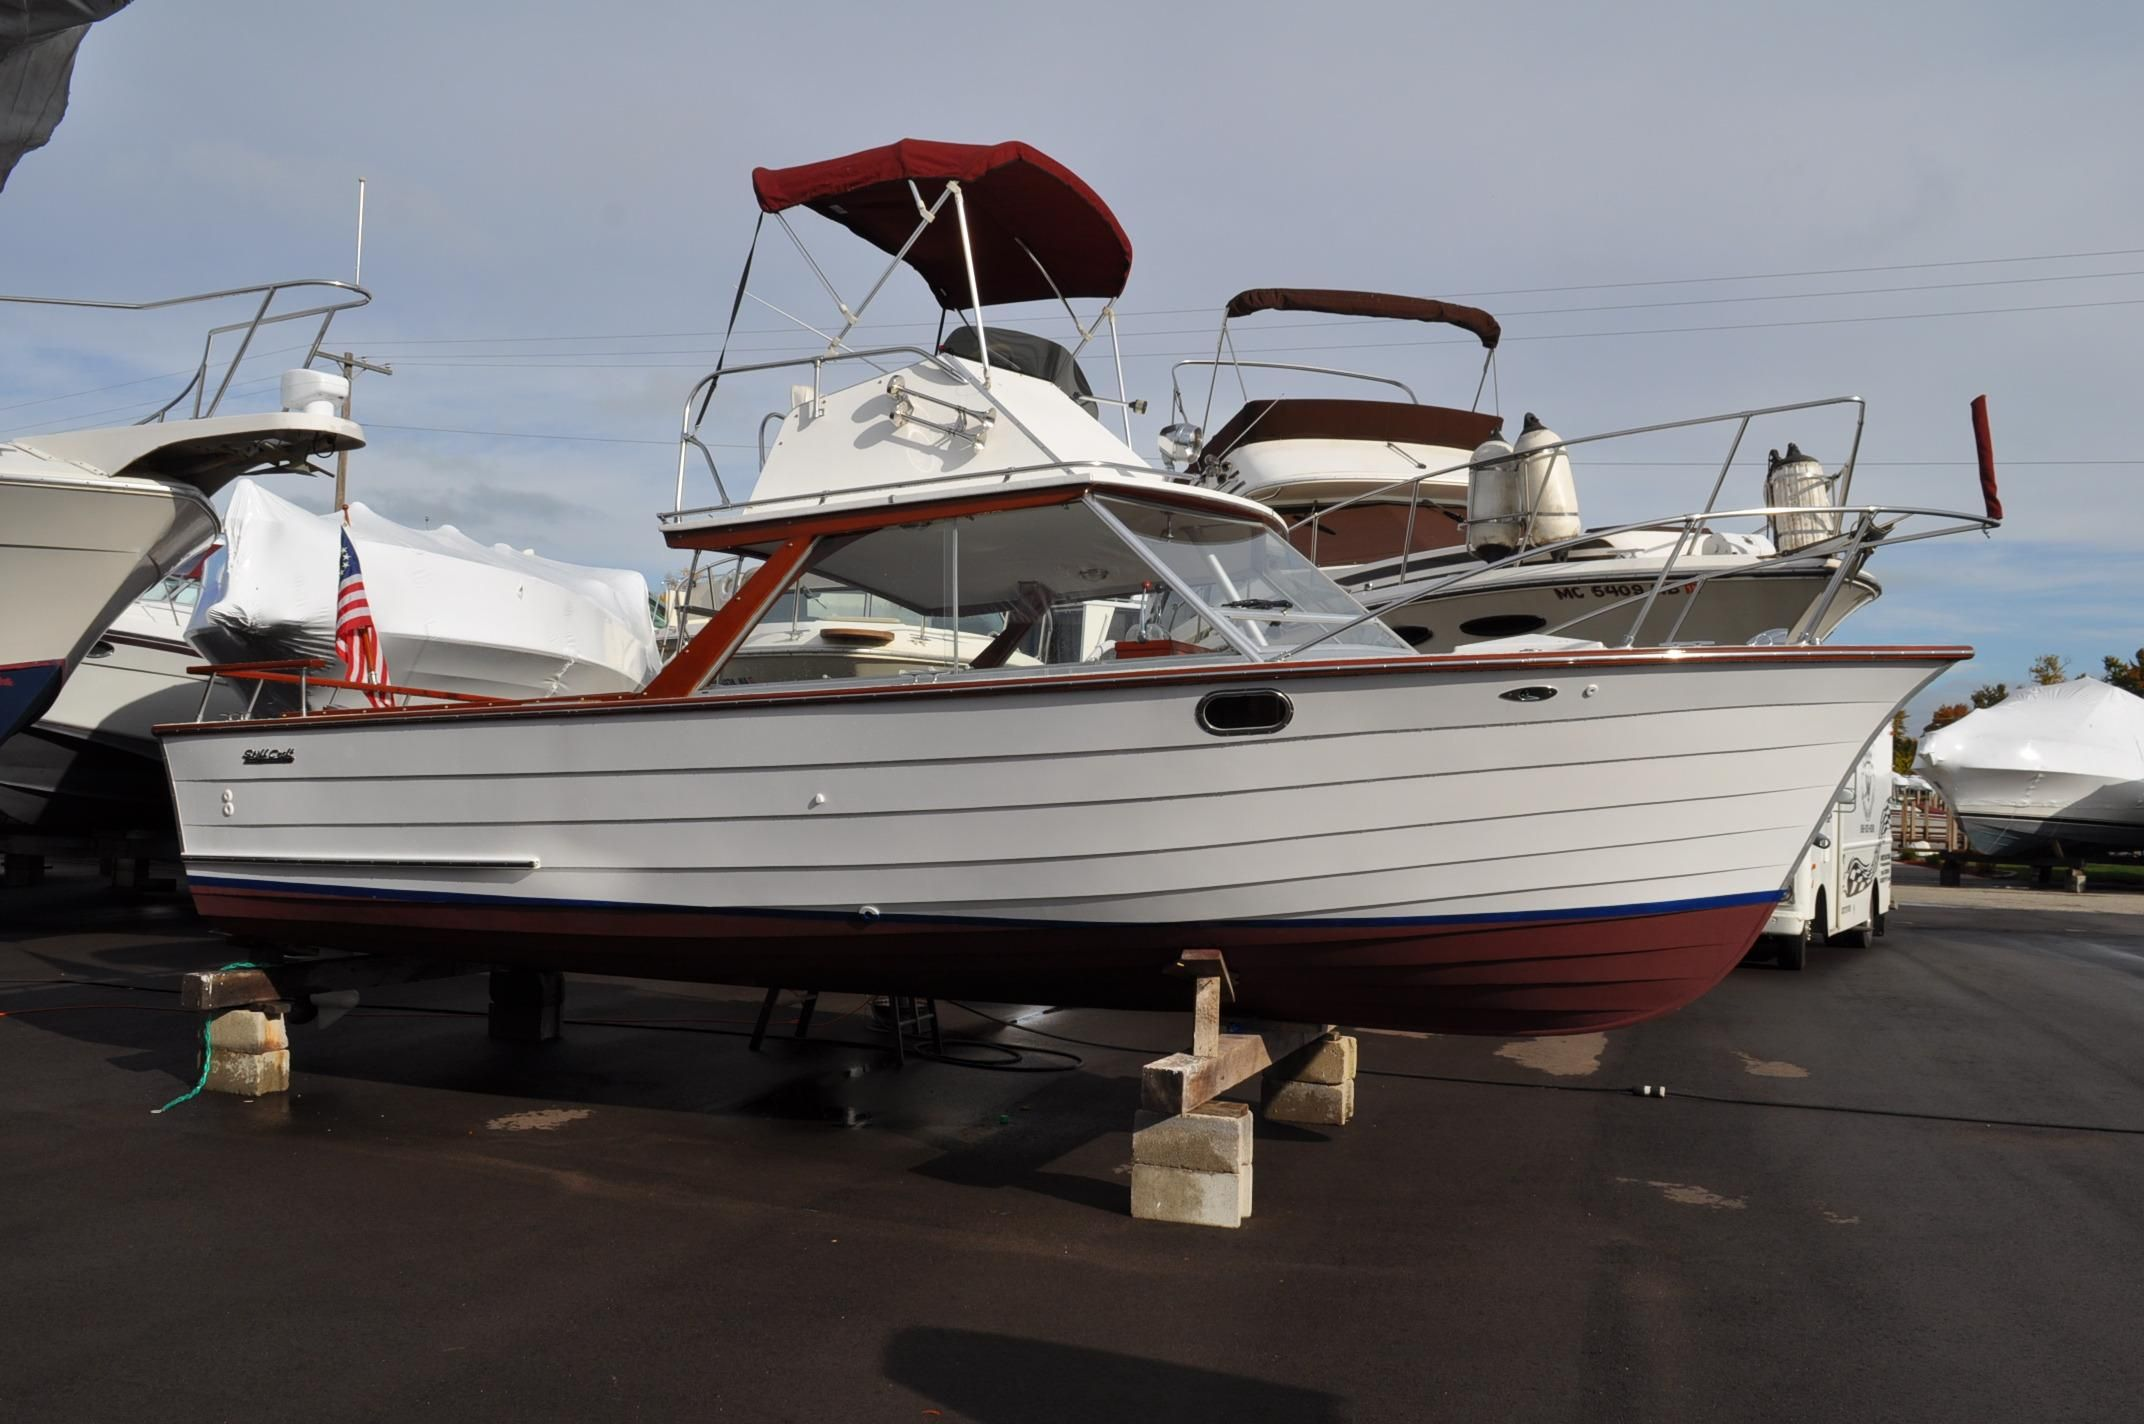 1973 skiff craft 26 flybridge fisherman power boat for for Skiff craft boats for sale